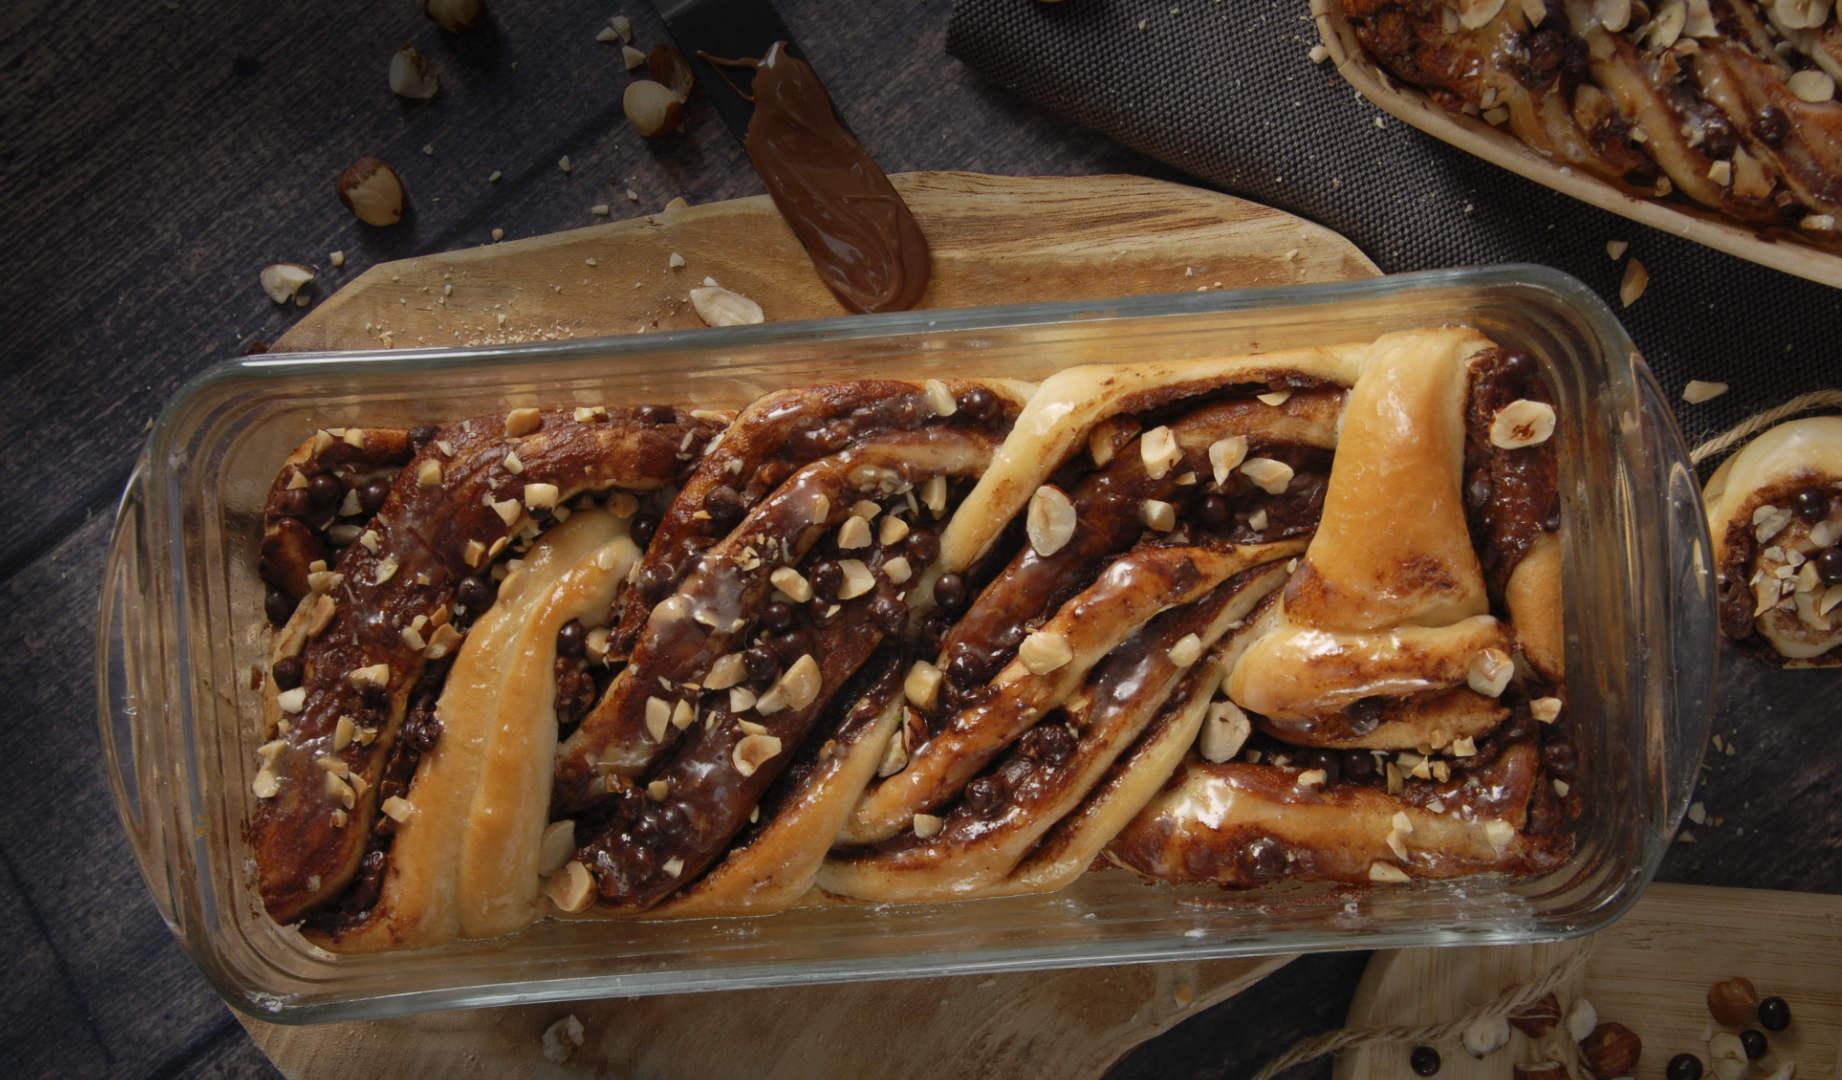 Recette babka chocolat facile_ les recettes de vanessa